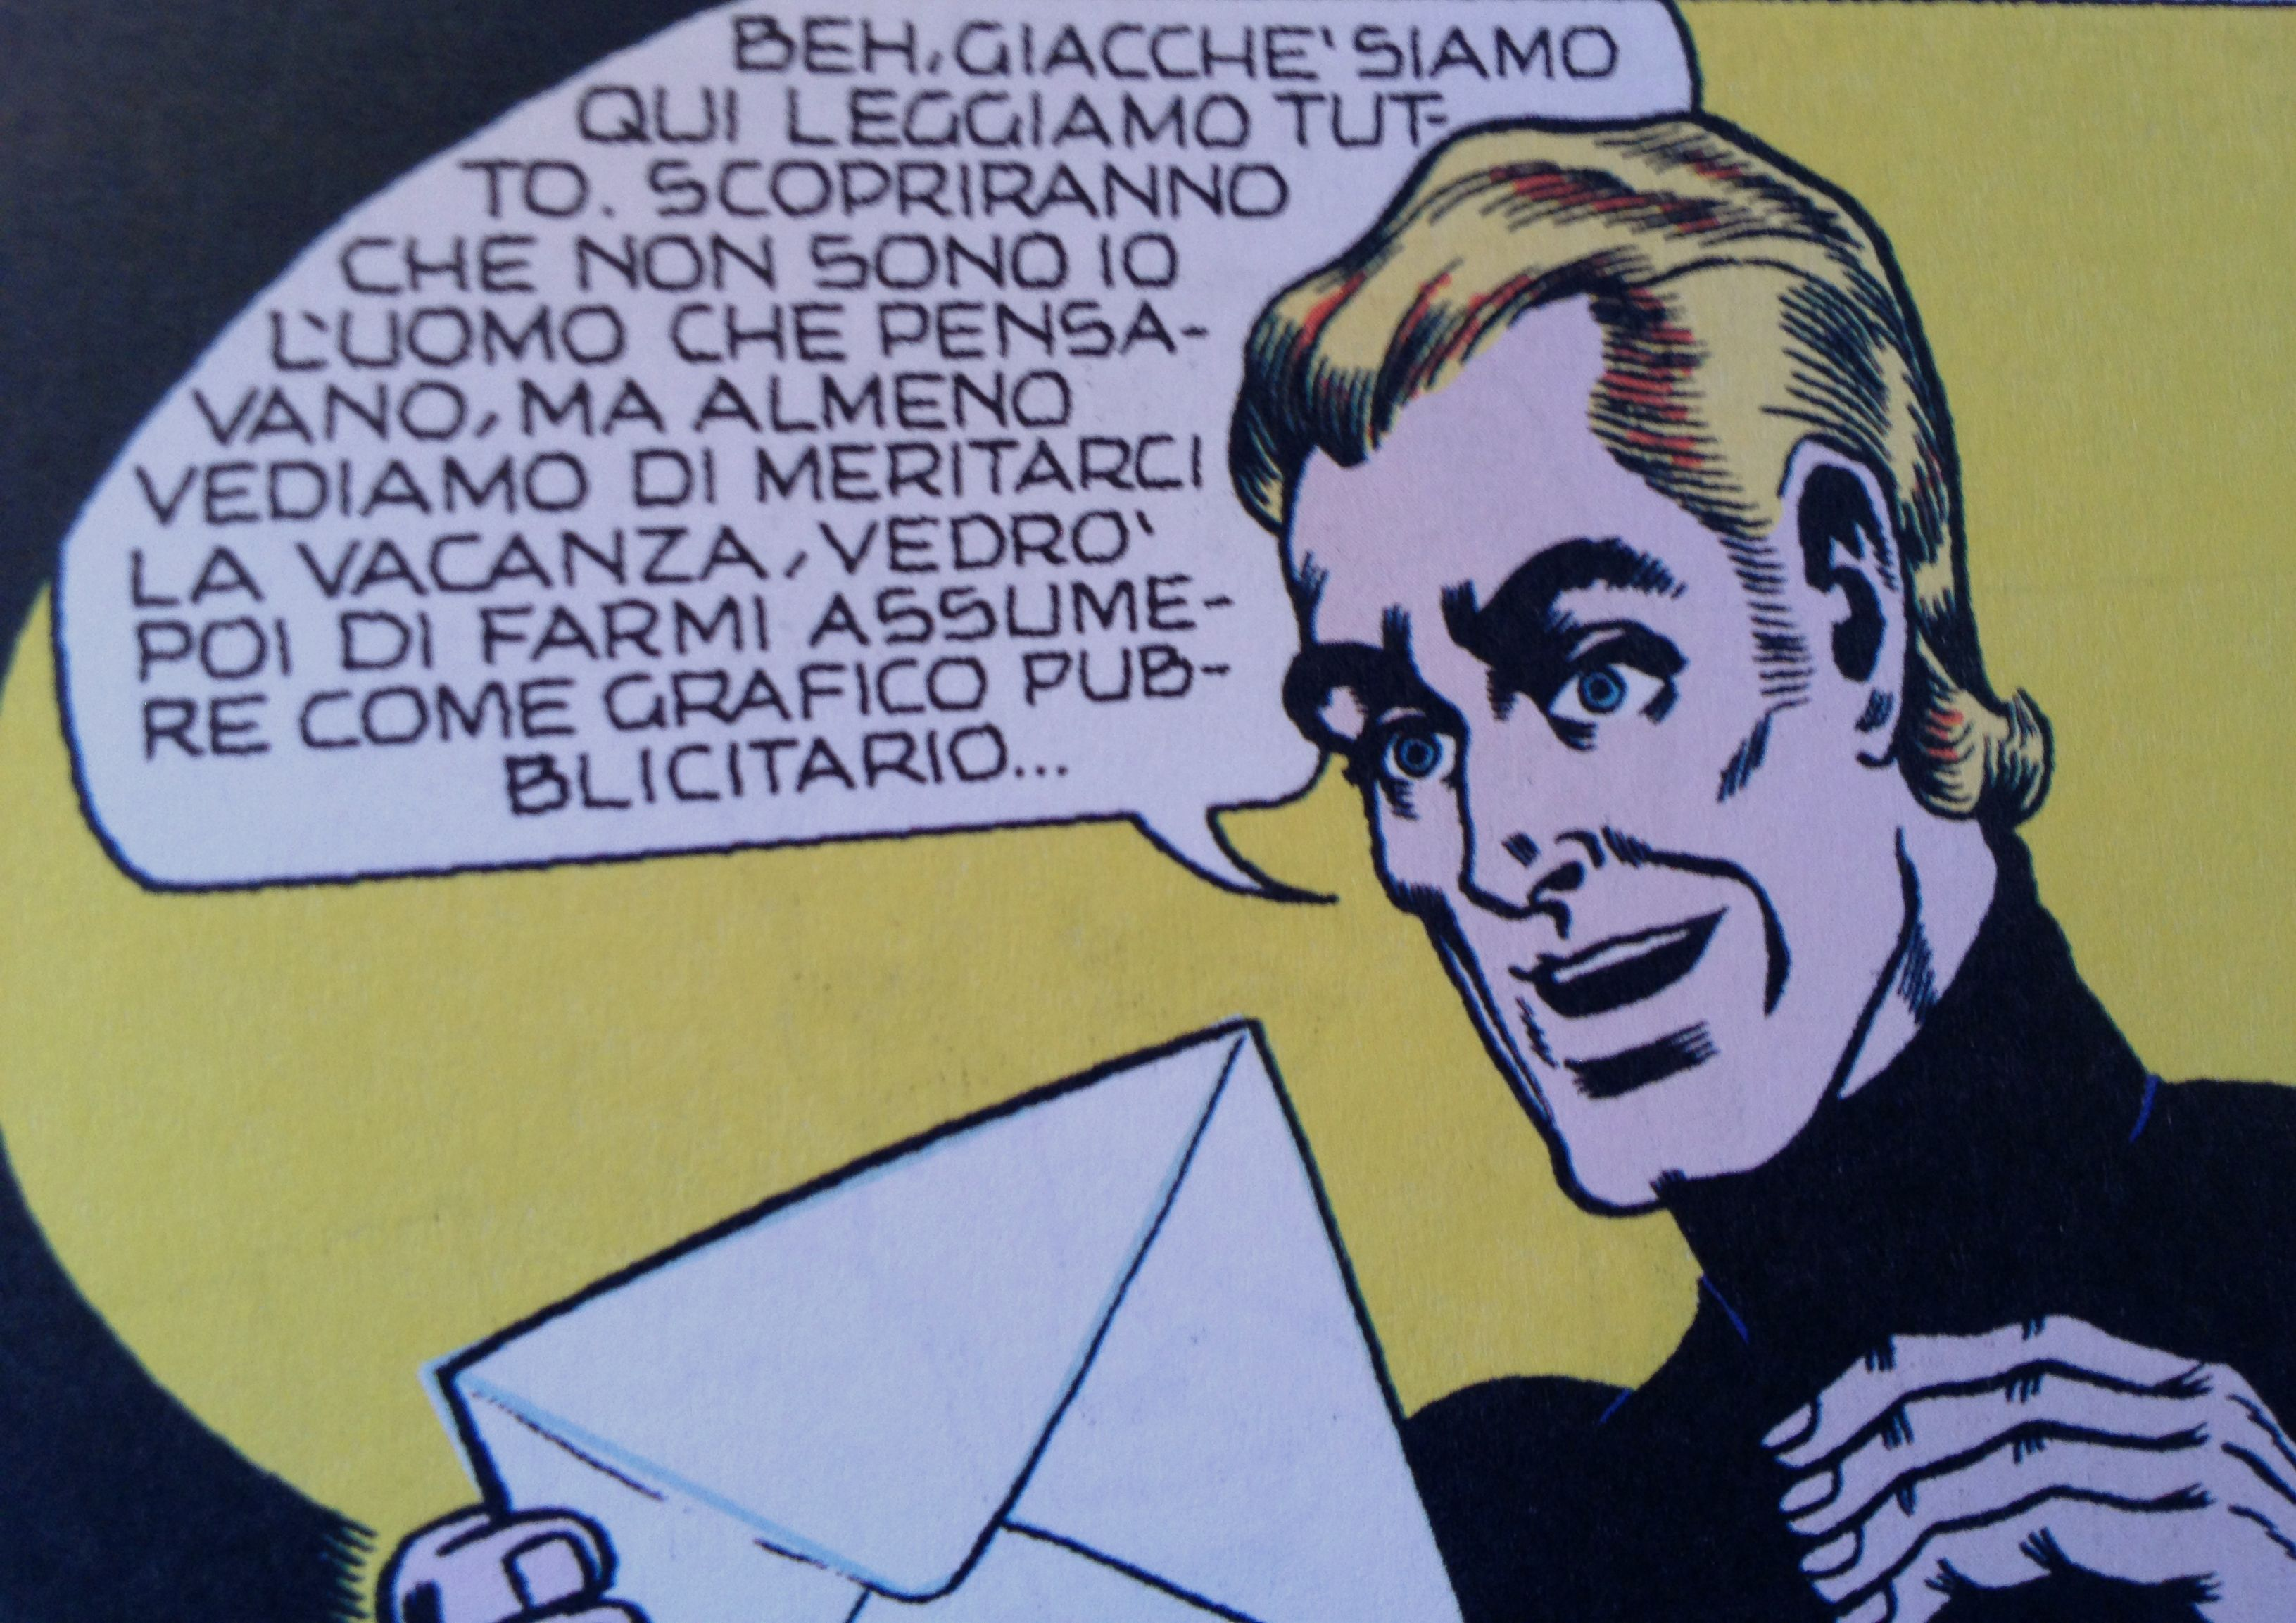 Alan ford gruppo t n t ubc enciclopedia online del fumetto - Alan Ford Gruppo T N T Ubc Enciclopedia Online Del Fumetto